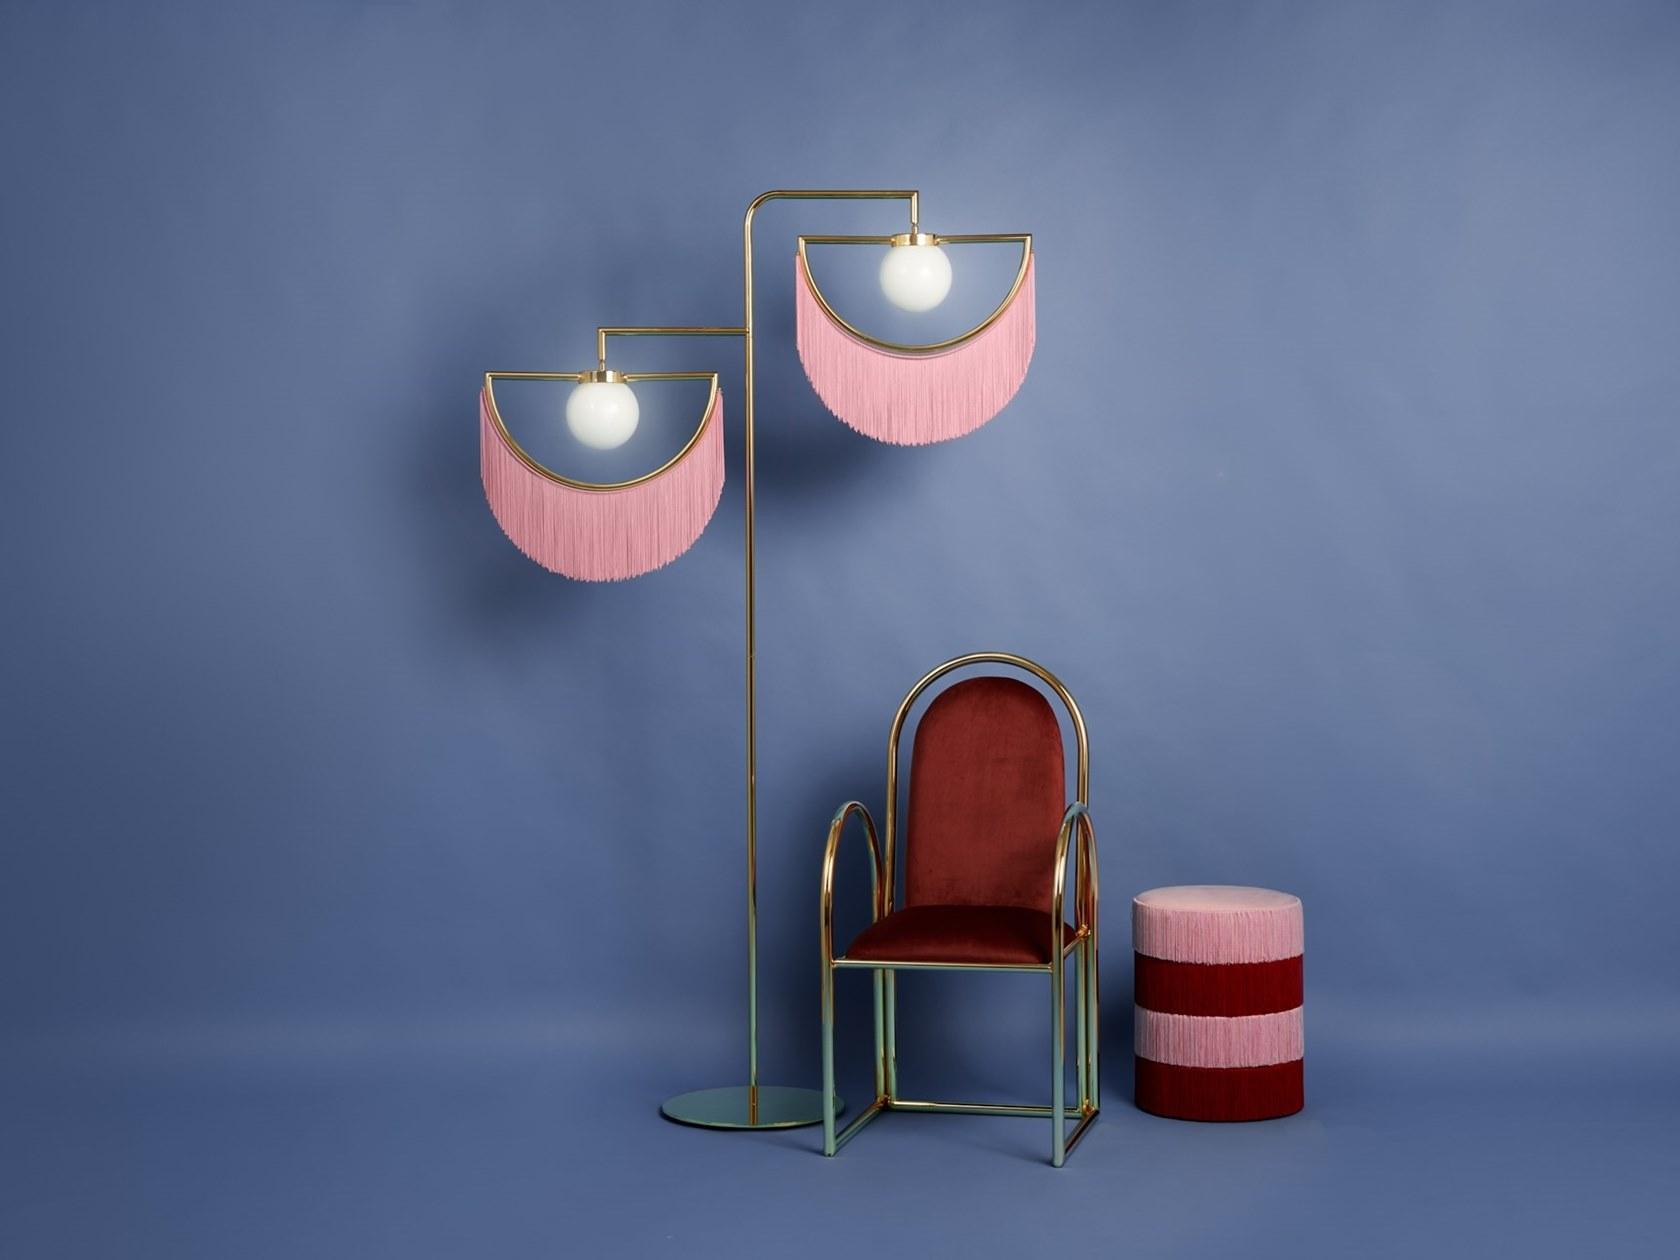 Lampada Da Studio Design 2b_wink-lampada-da-terra-houtique-359619-rel6fe4947d